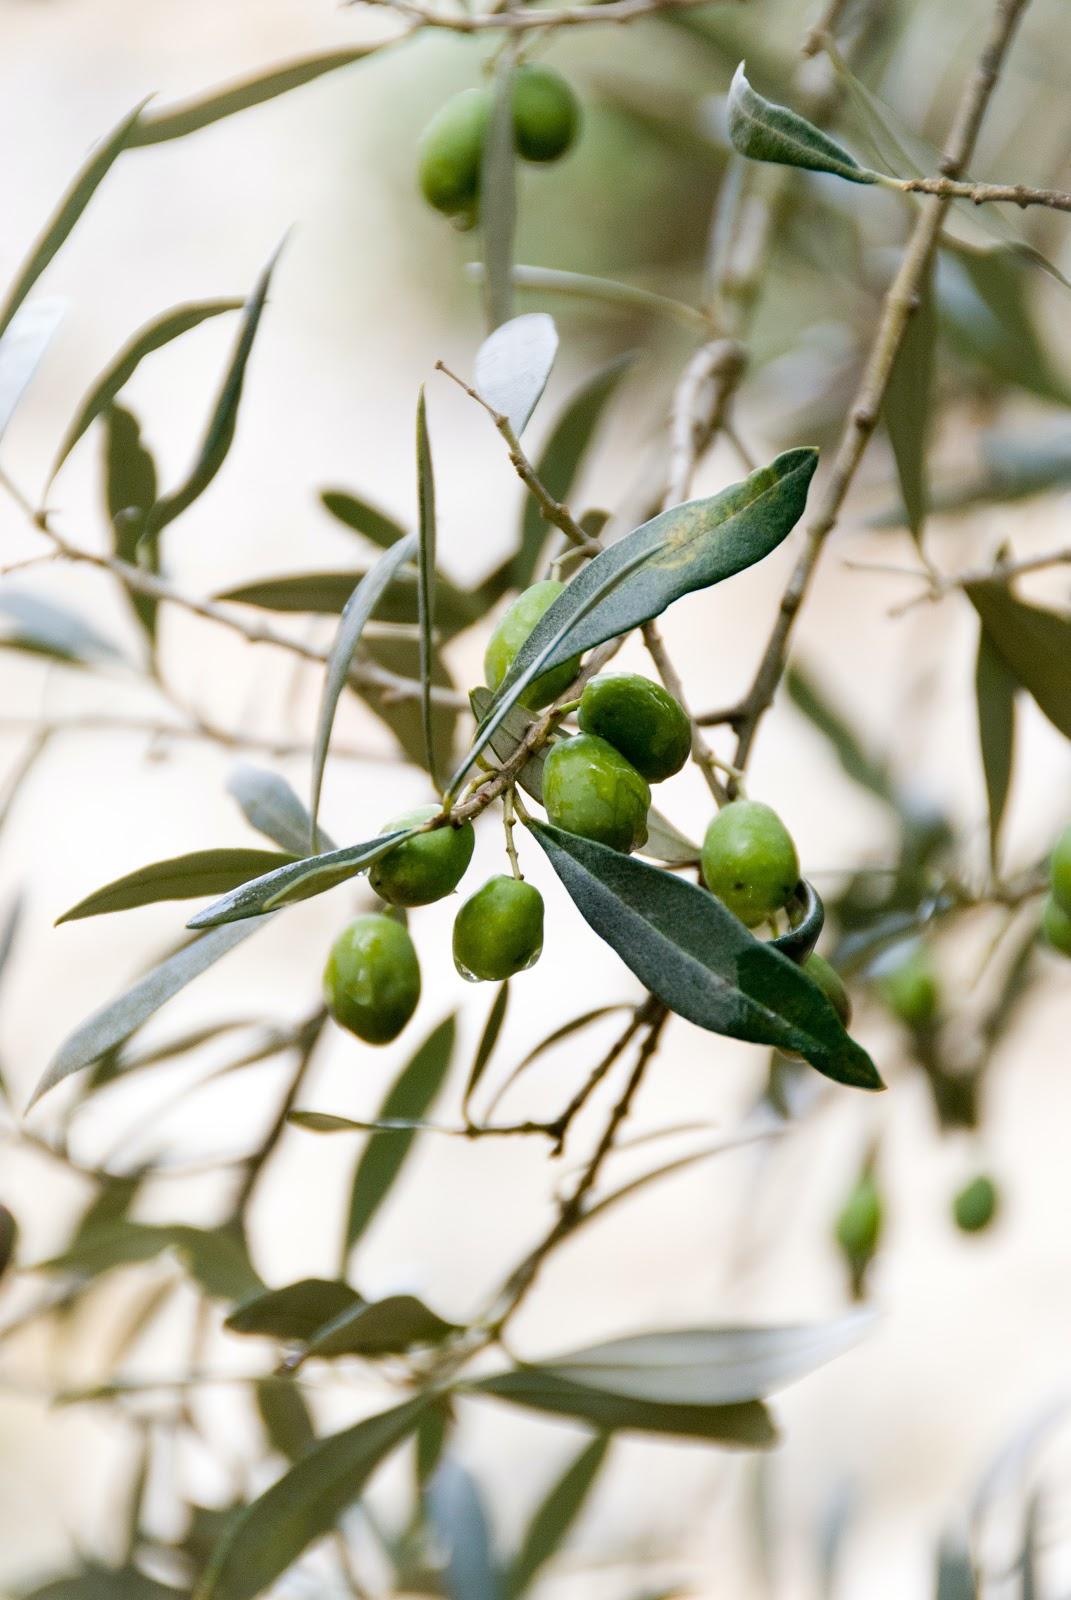 Antioxidants in olive oil